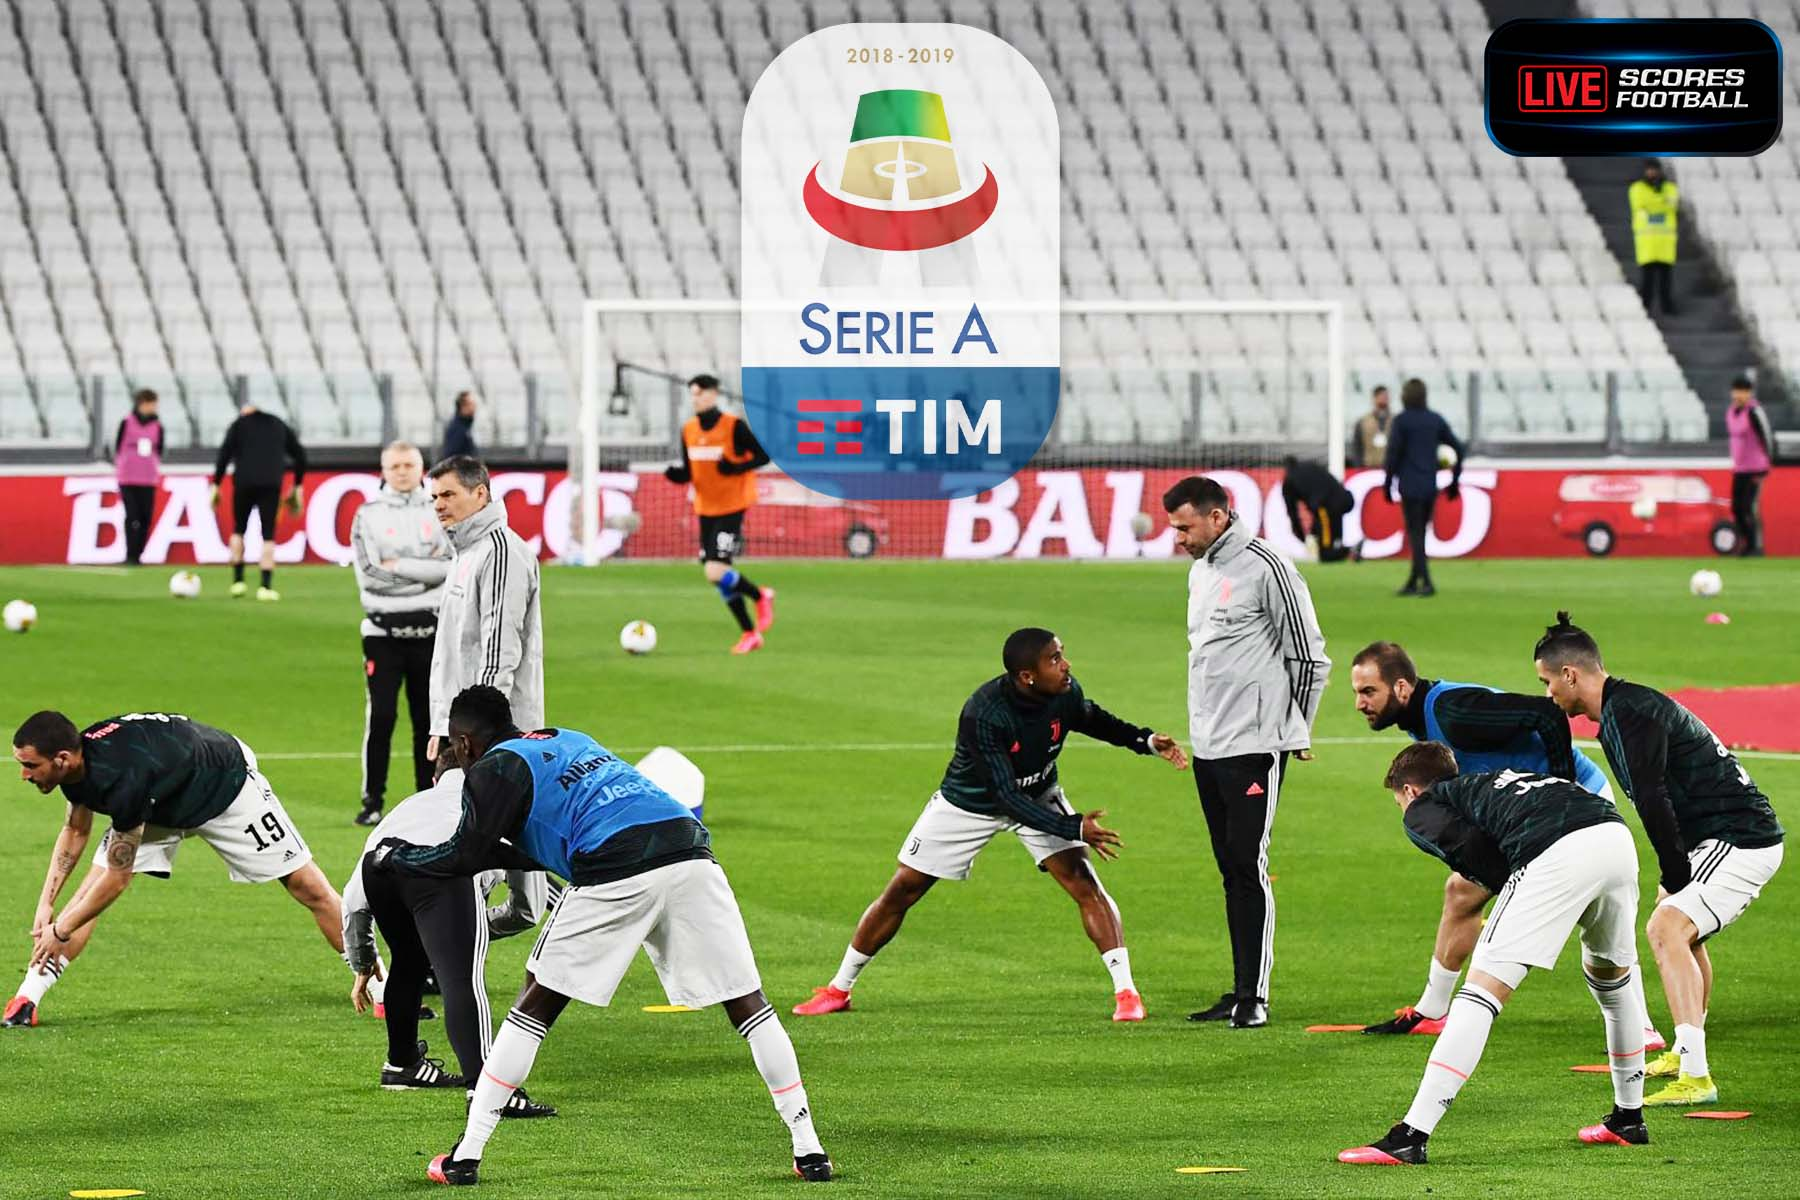 Read more about the article แฟนบอลได้ เฮ ลีกอิตาลีก็เป็นอีกรายการที่นักเตะกลับมาเริ่มซ้อมกันได้แล้ว